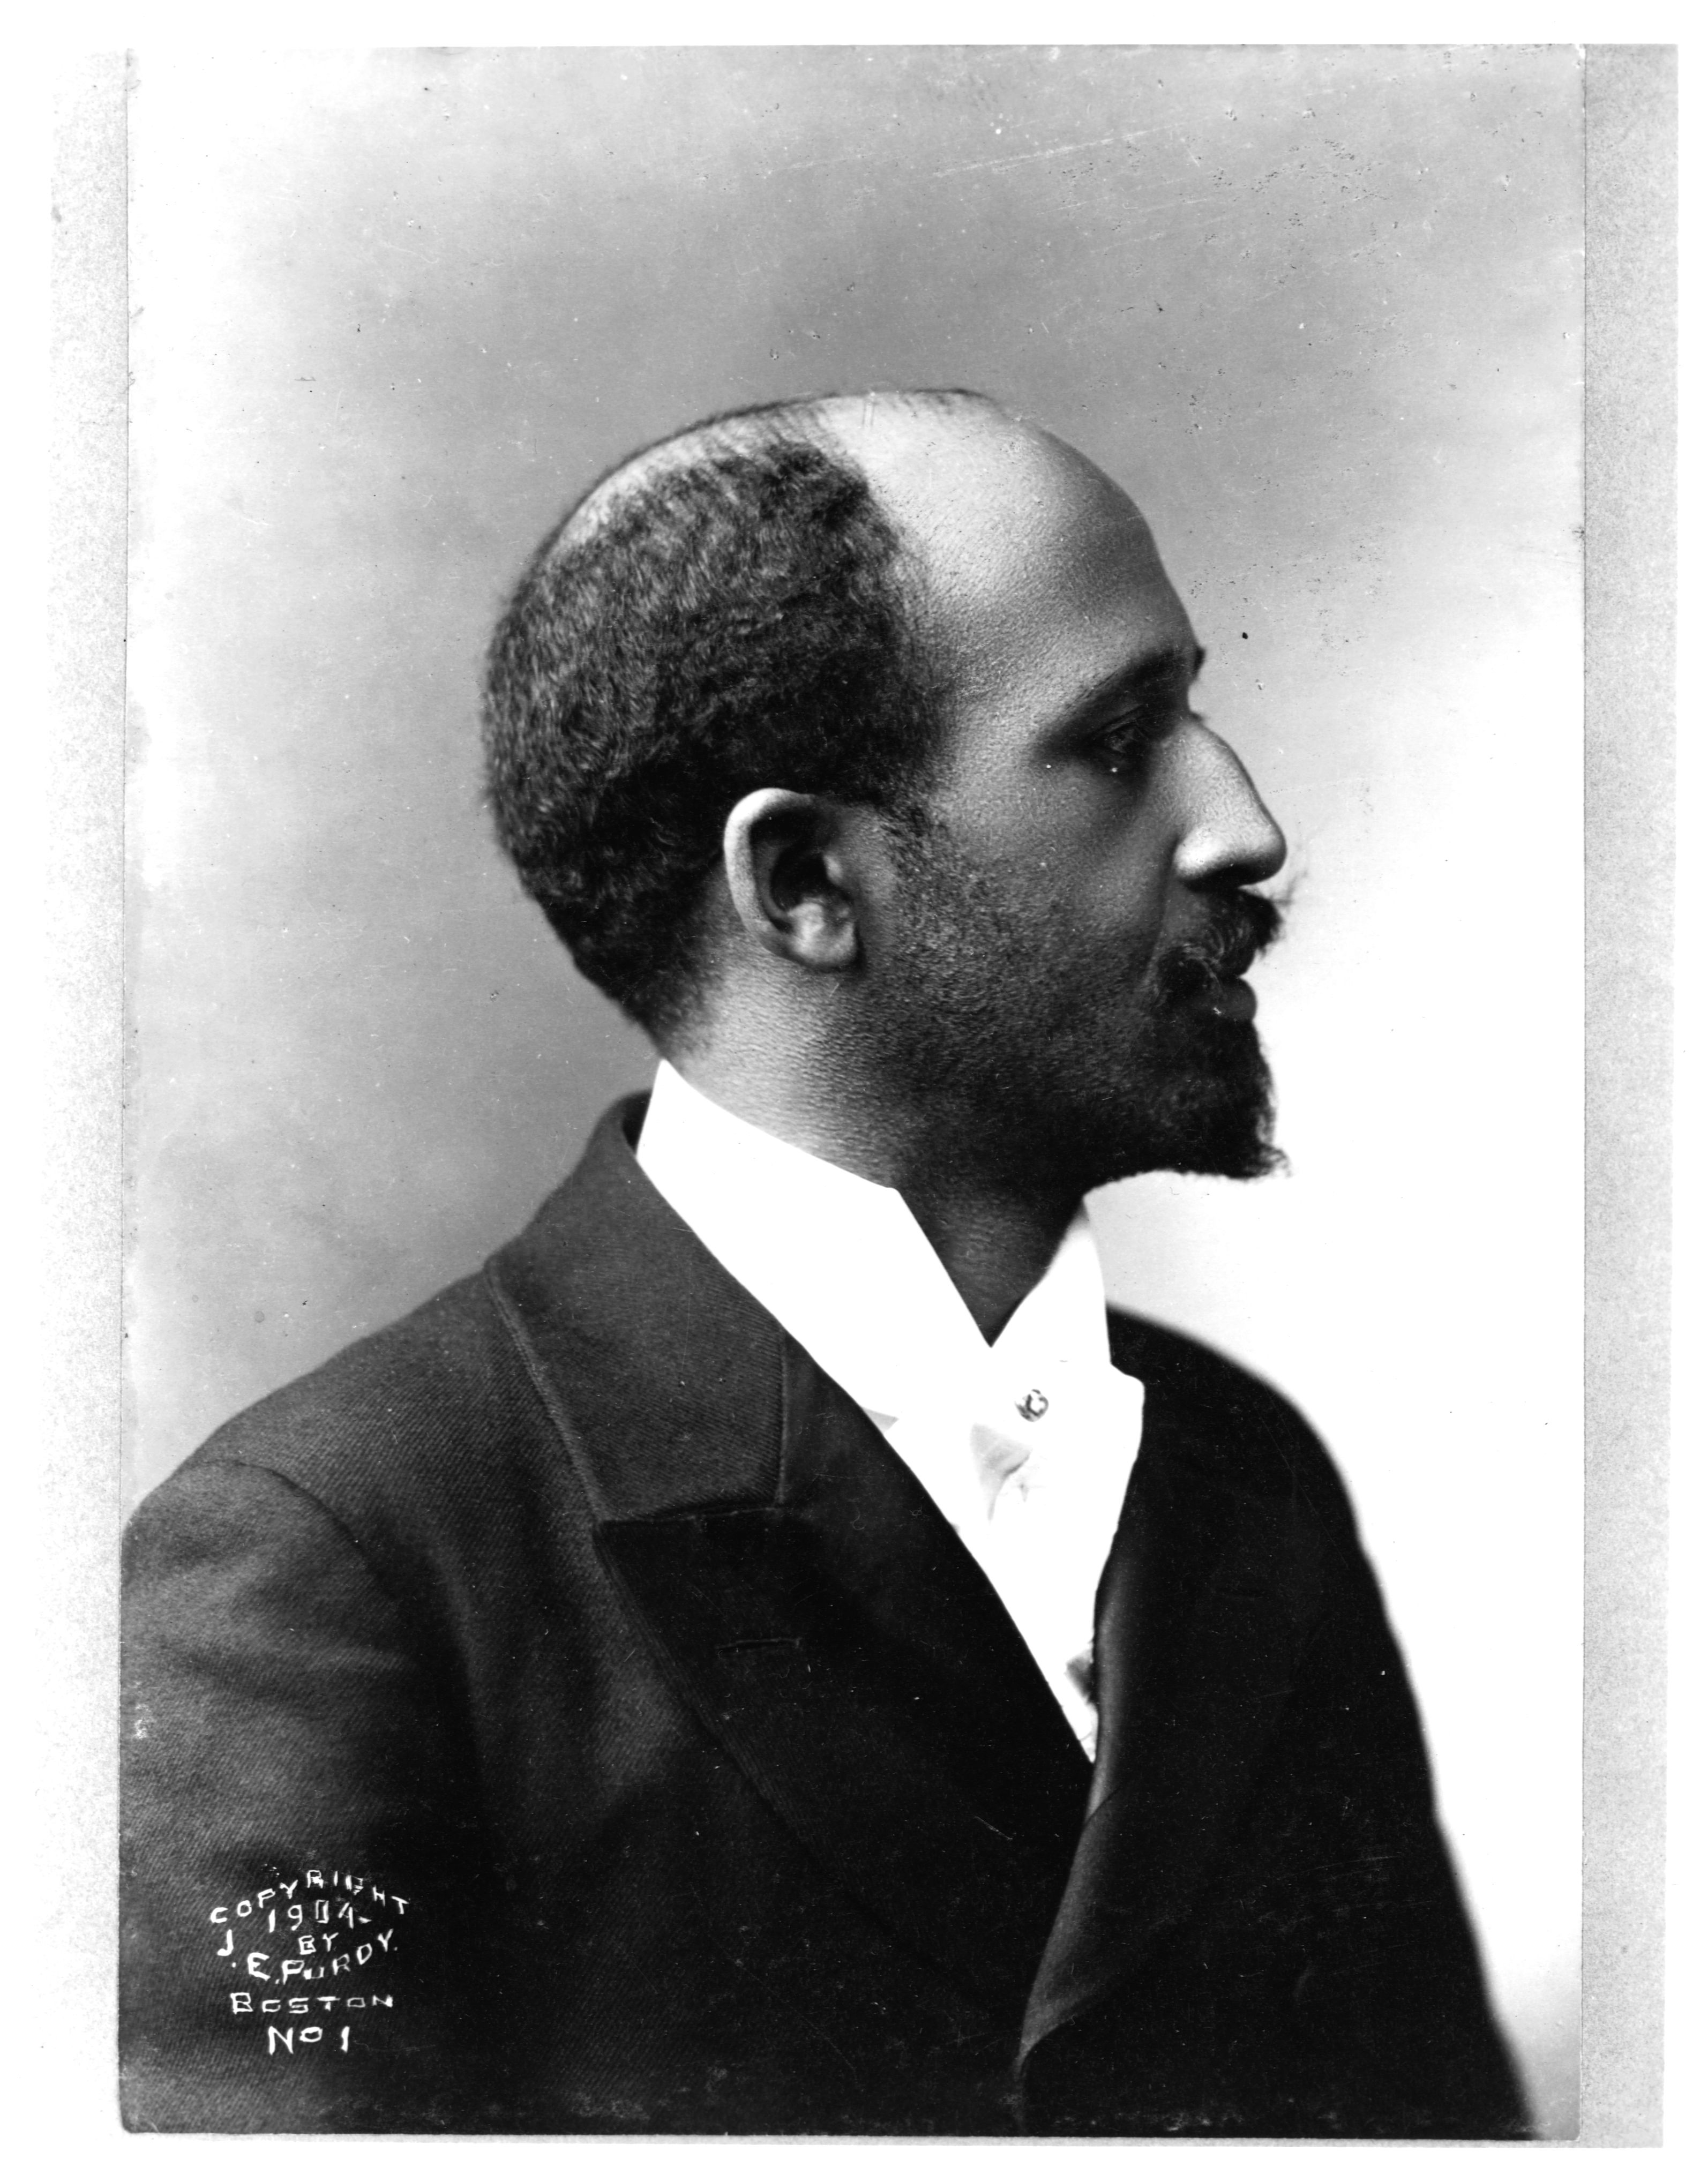 Black and white photograph of W.E.B. Du Bois in profile.